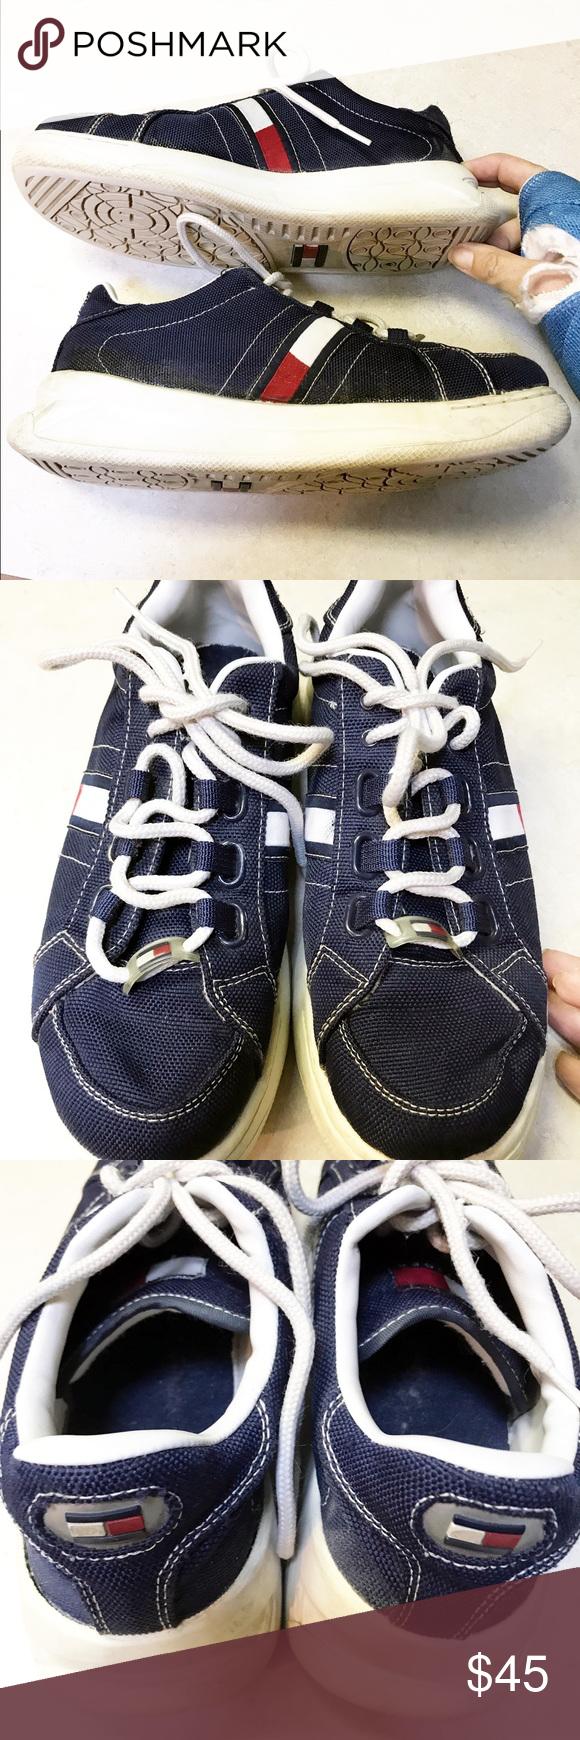 ca7c978ecc7310 VTG Tommy Hilfiger 8 platform canvas sneaker 90s VTG Tommy Hilfiger size 8  canvas platform sneaker